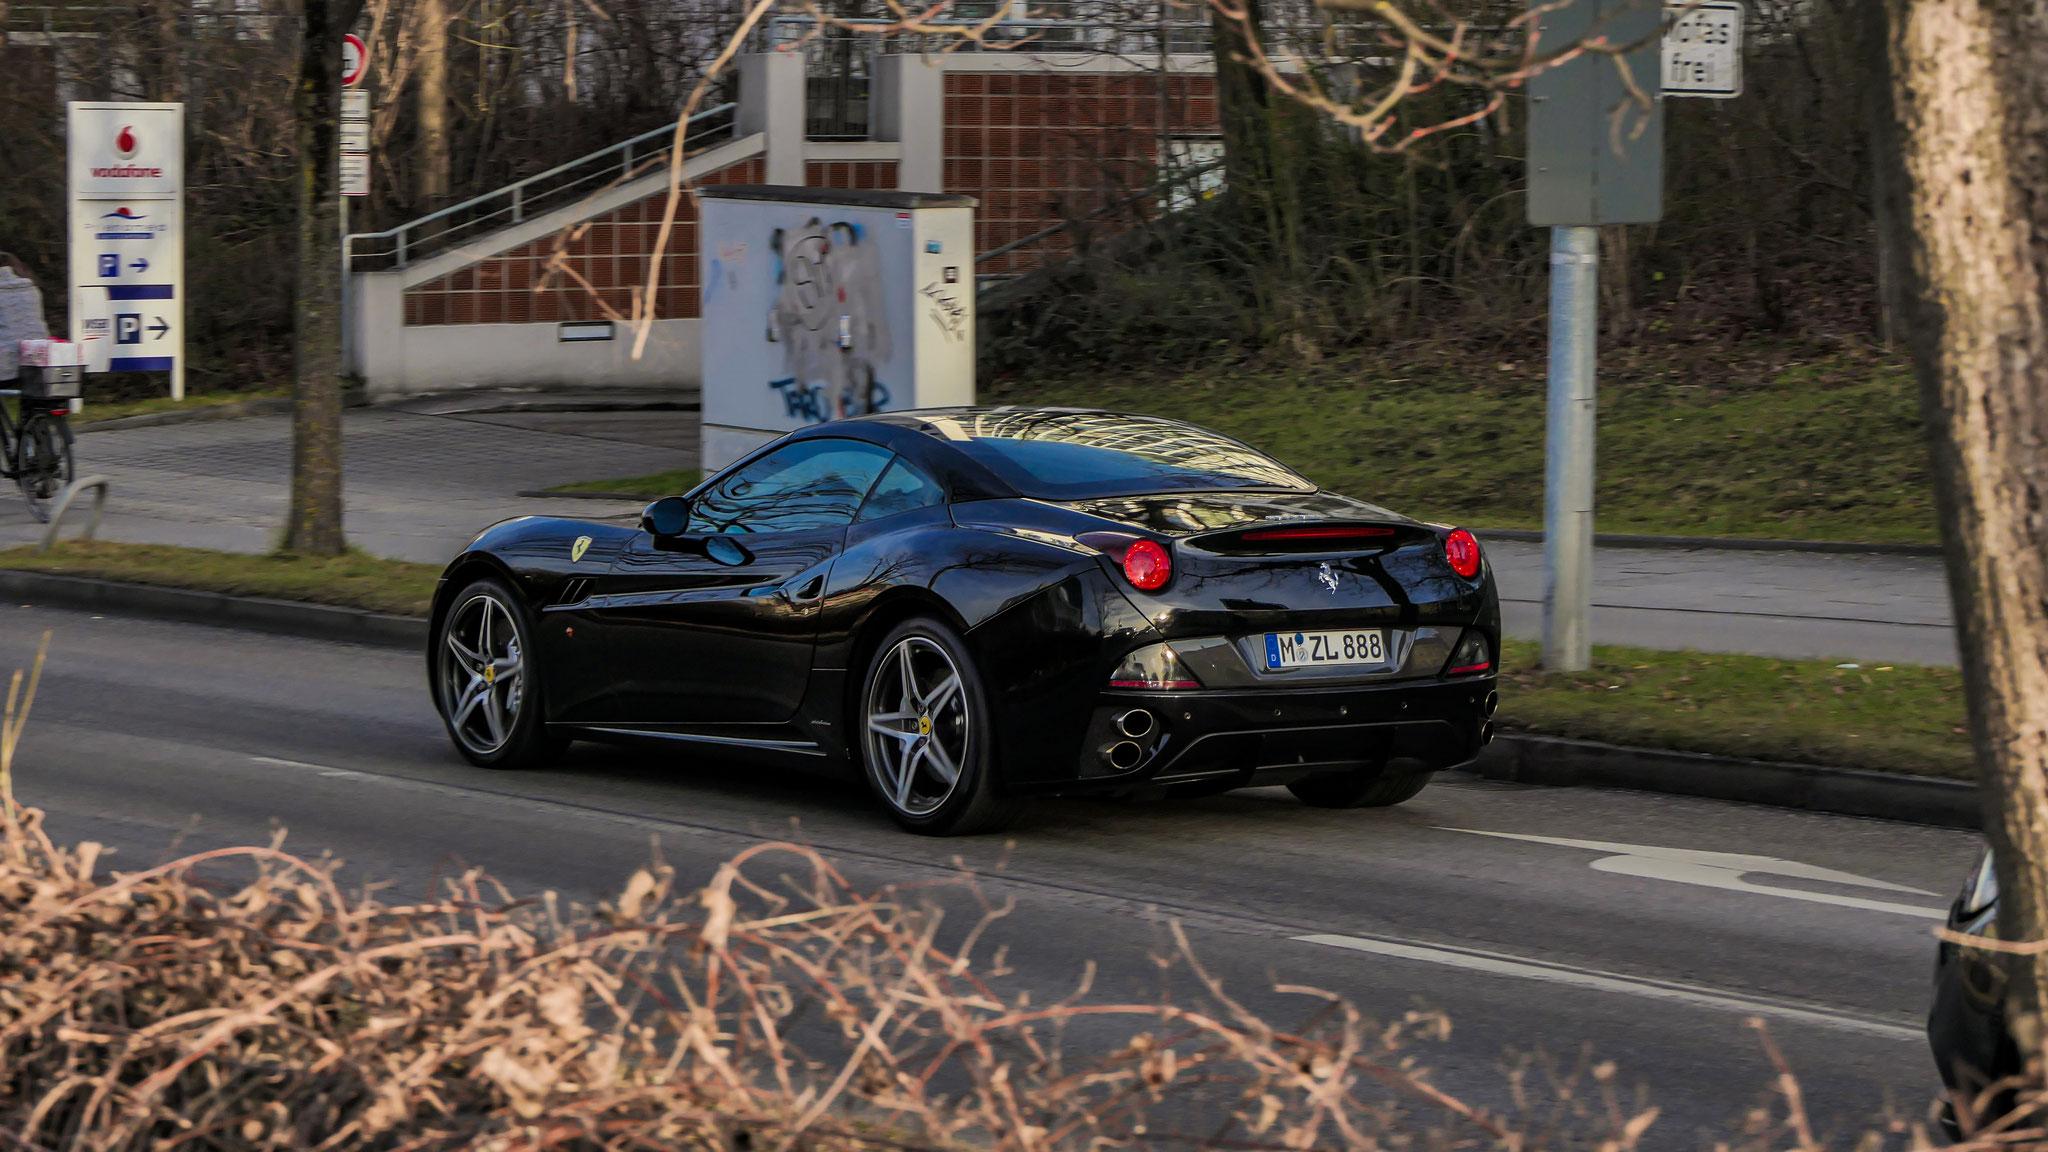 Ferrari California T - M-ZL-888